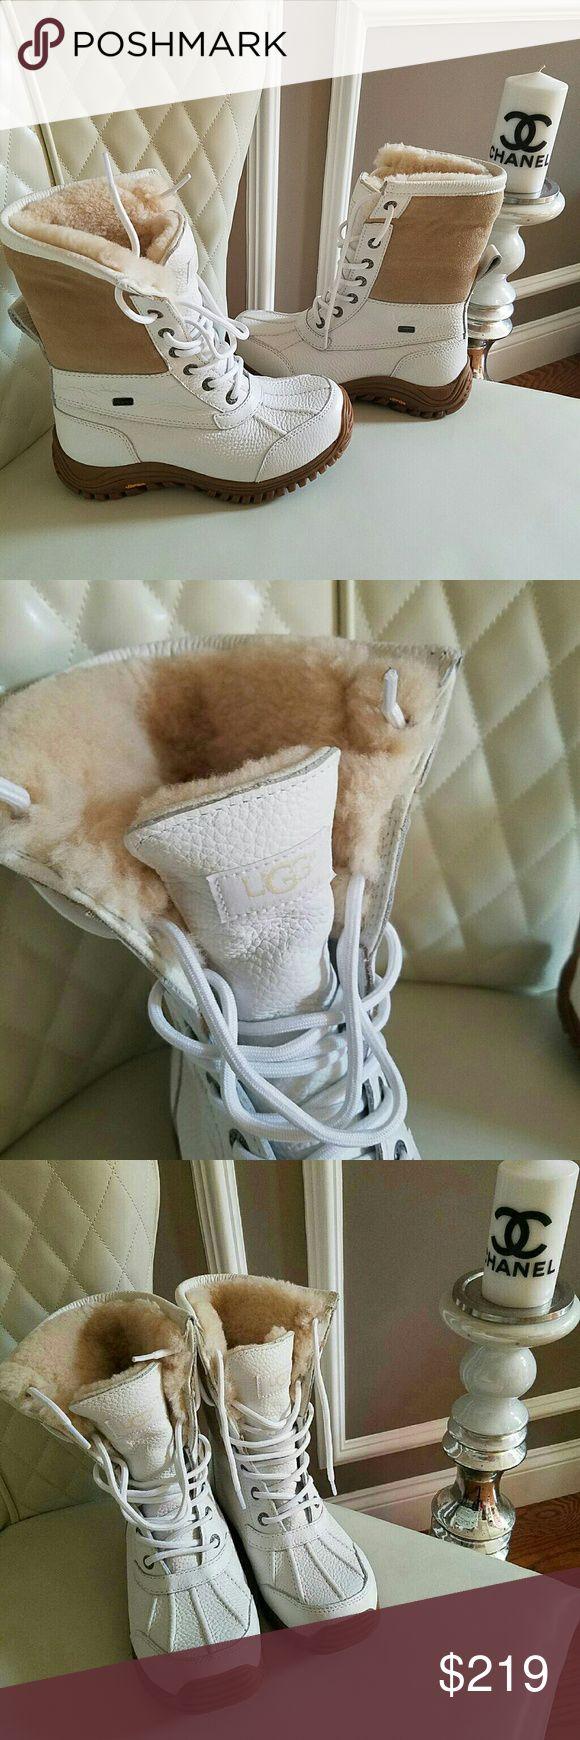 New UGG White Shearling Adirondack II boots size 6 Brand new UGG White Shearling Adirondack II boots size 6 Retail  $350 UGG Shoes Winter & Rain Boots